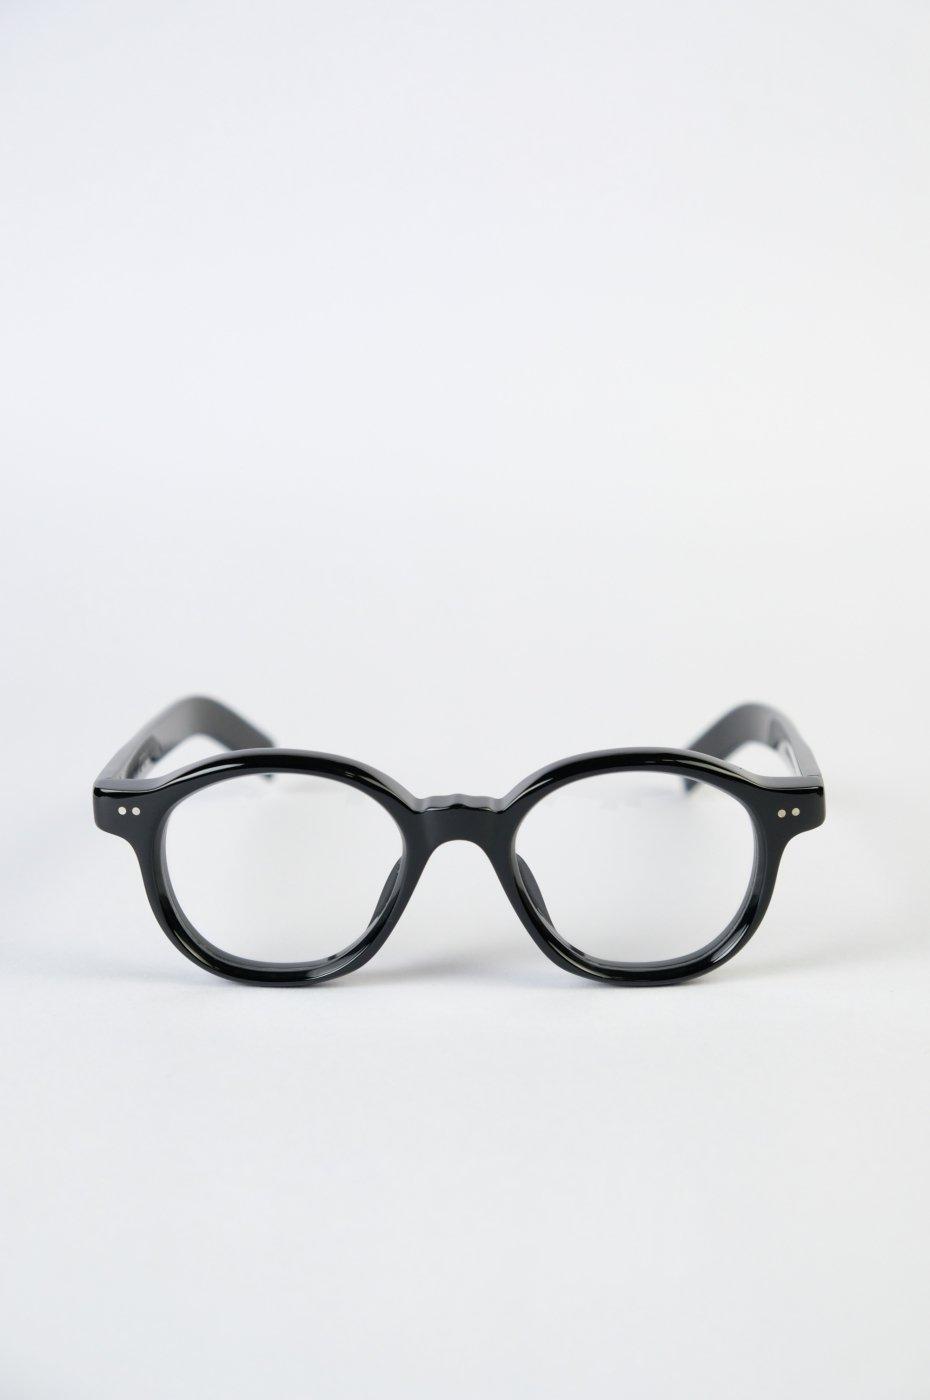 guépard ギュパール-gp-10-Noir-Clear Lens-